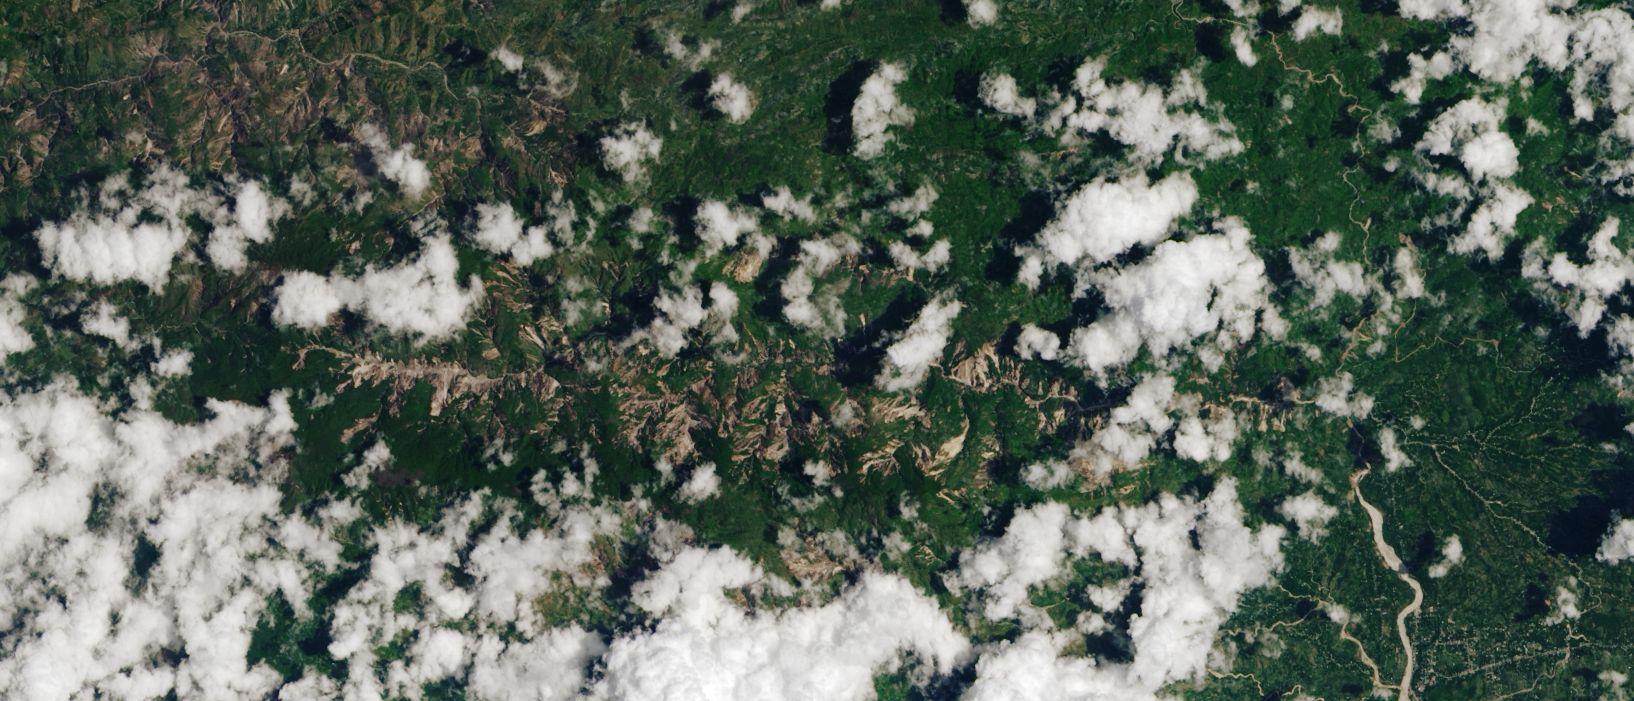 haitiearthquake_oli_august-14-2021_cut